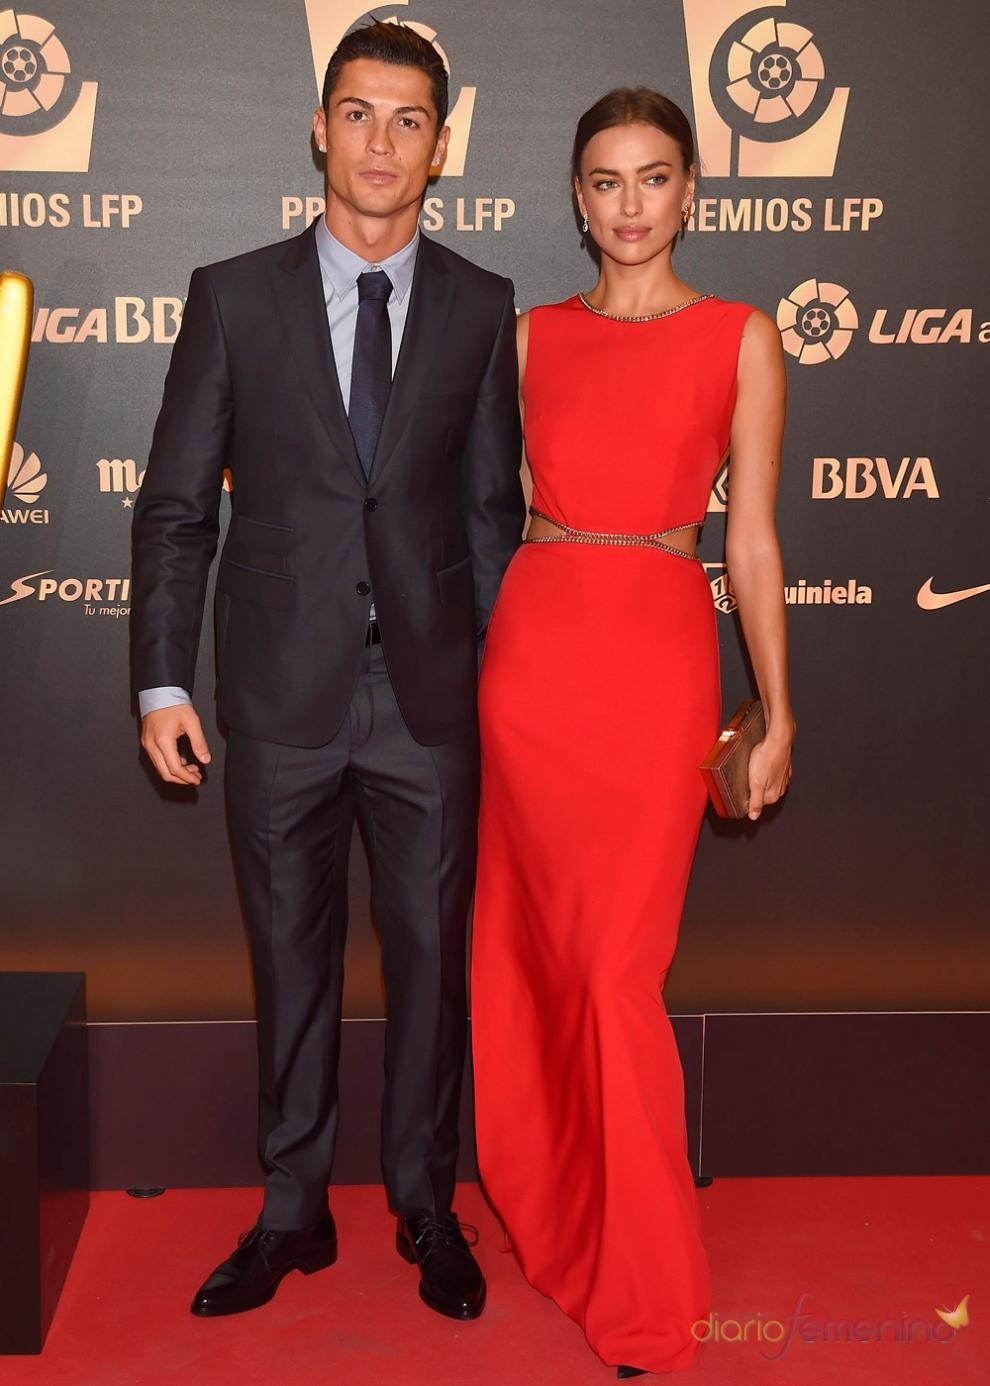 Cristiano Ronaldo e Irina Shayk, en los Premios de la LFP 2014